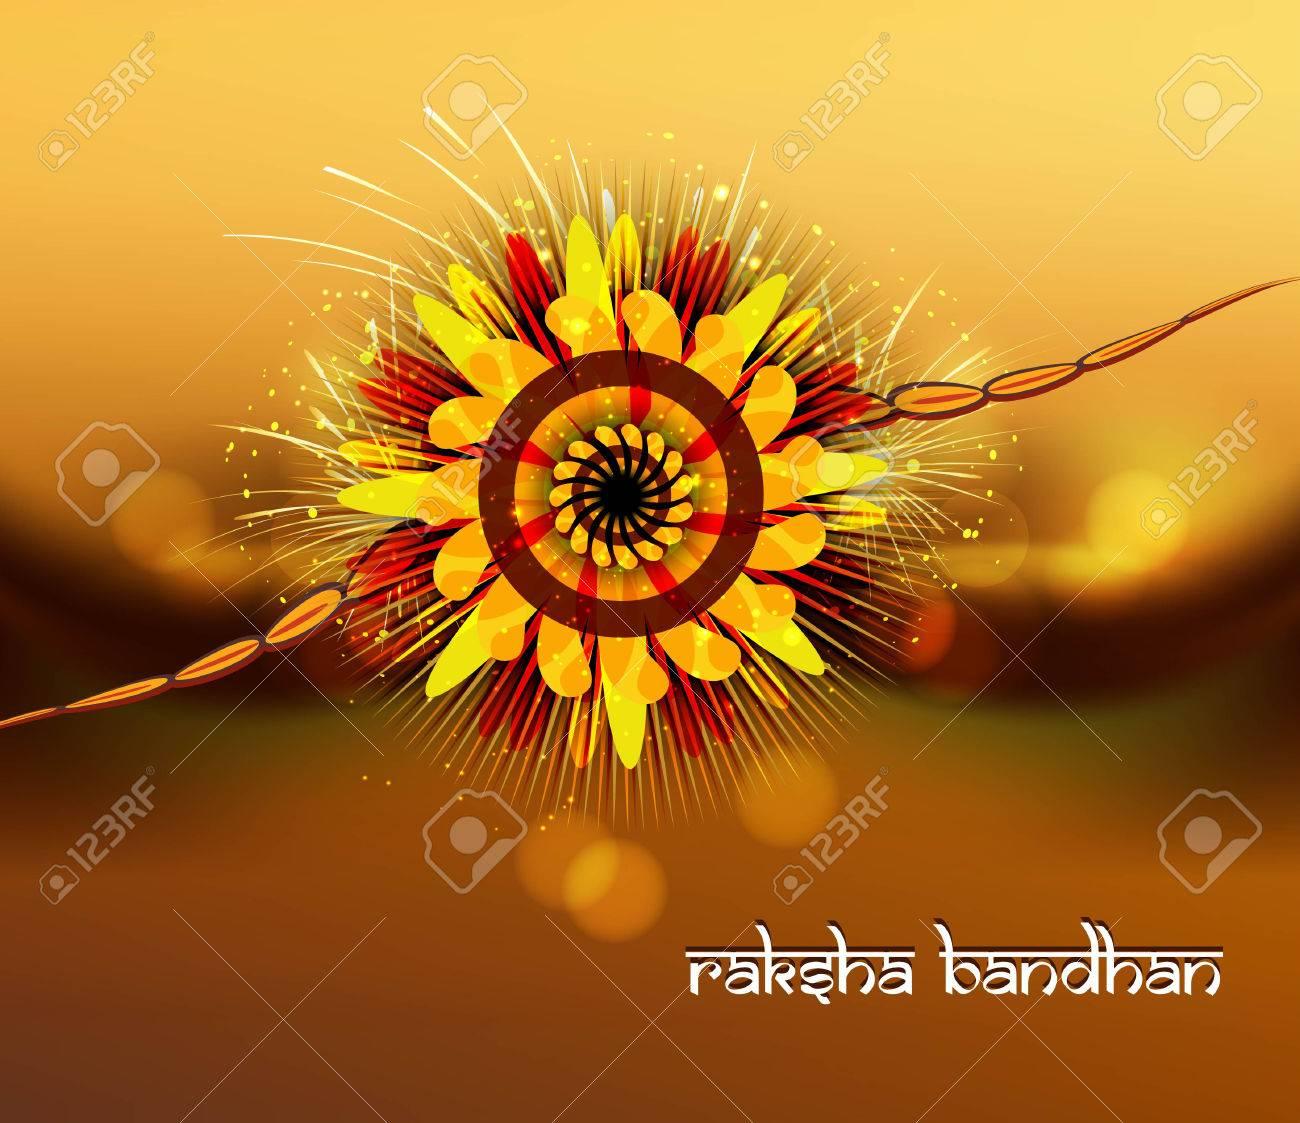 Beautiful rakhi for raksha bandhan bright colorful celebration Stock Vector - 23519830